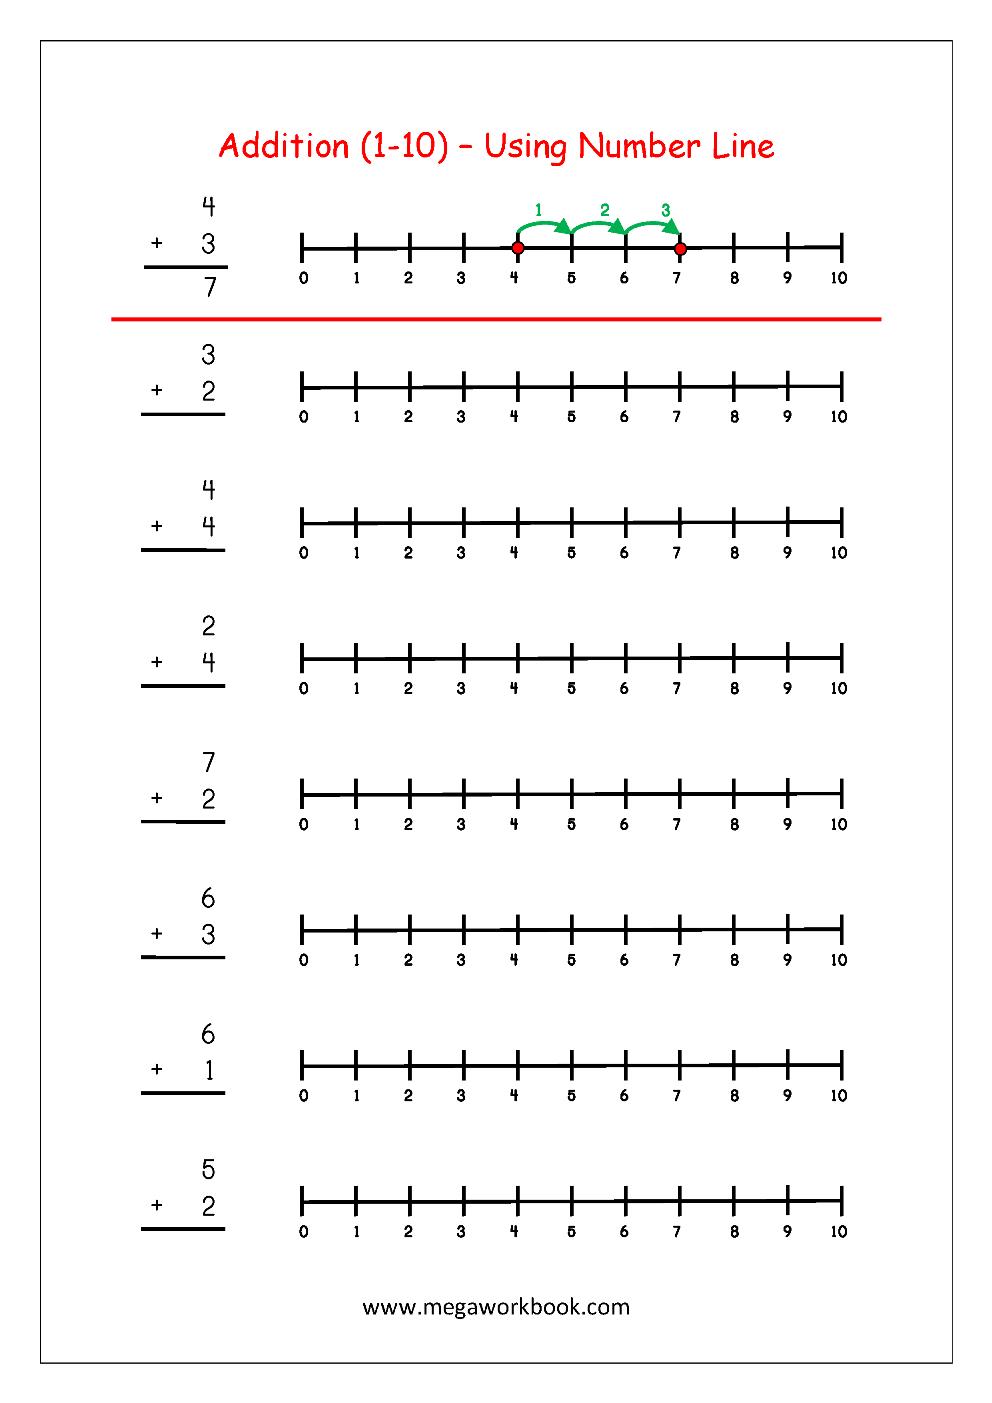 Free Printable Number Addition Worksheets (1-10) For Kindergarten - Free Printable Number Line Worksheets